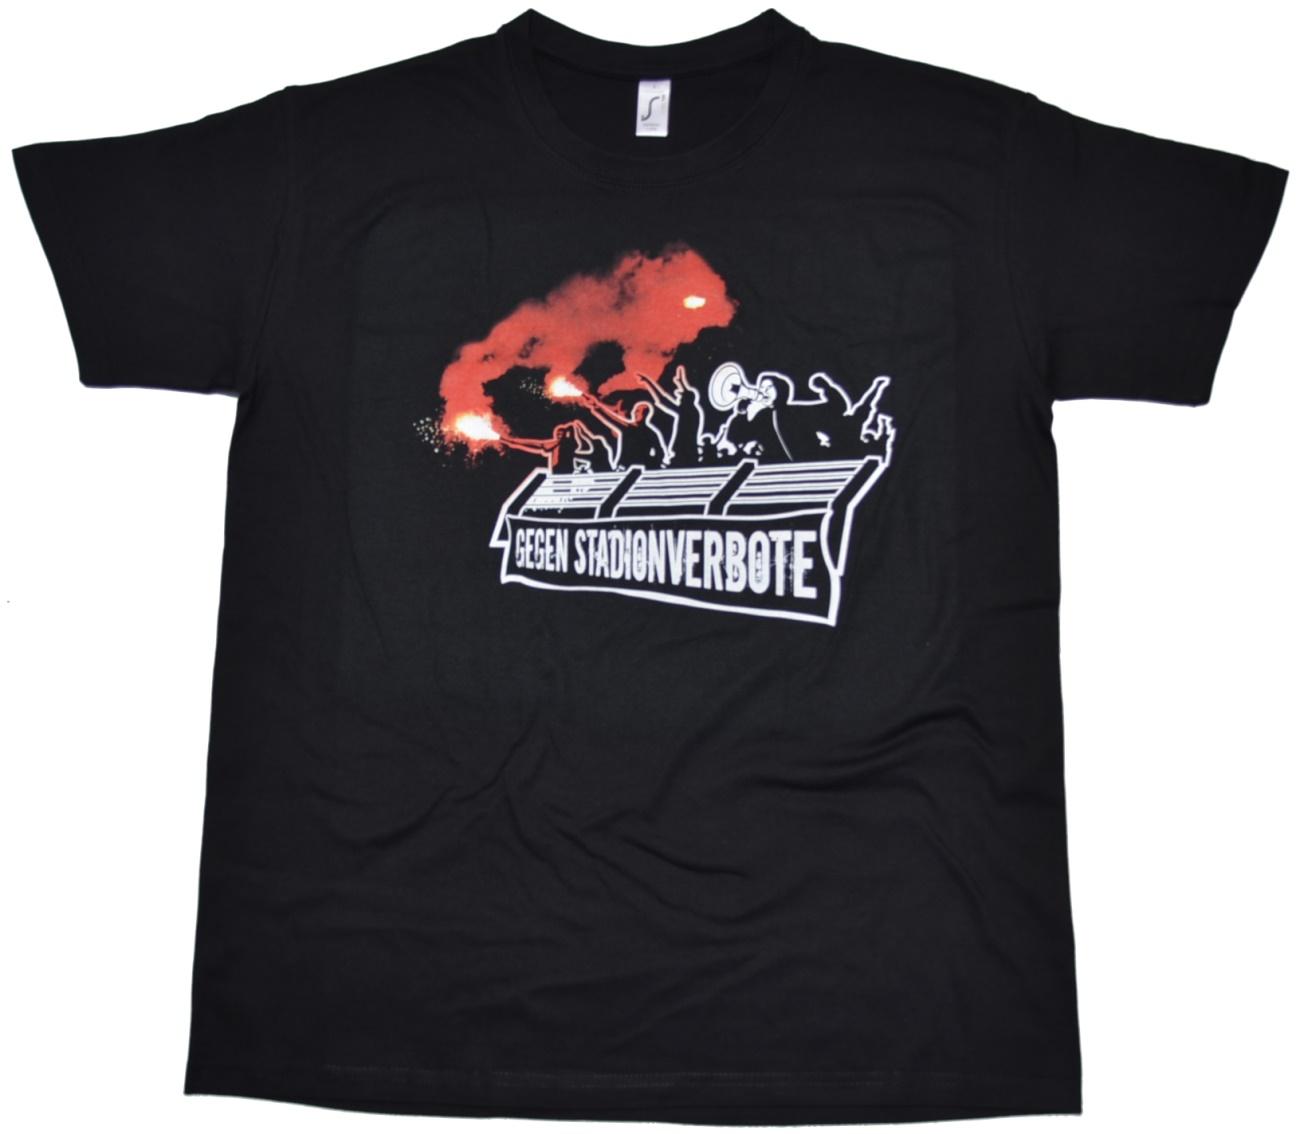 T-Shirt Gegen Stadionverbote